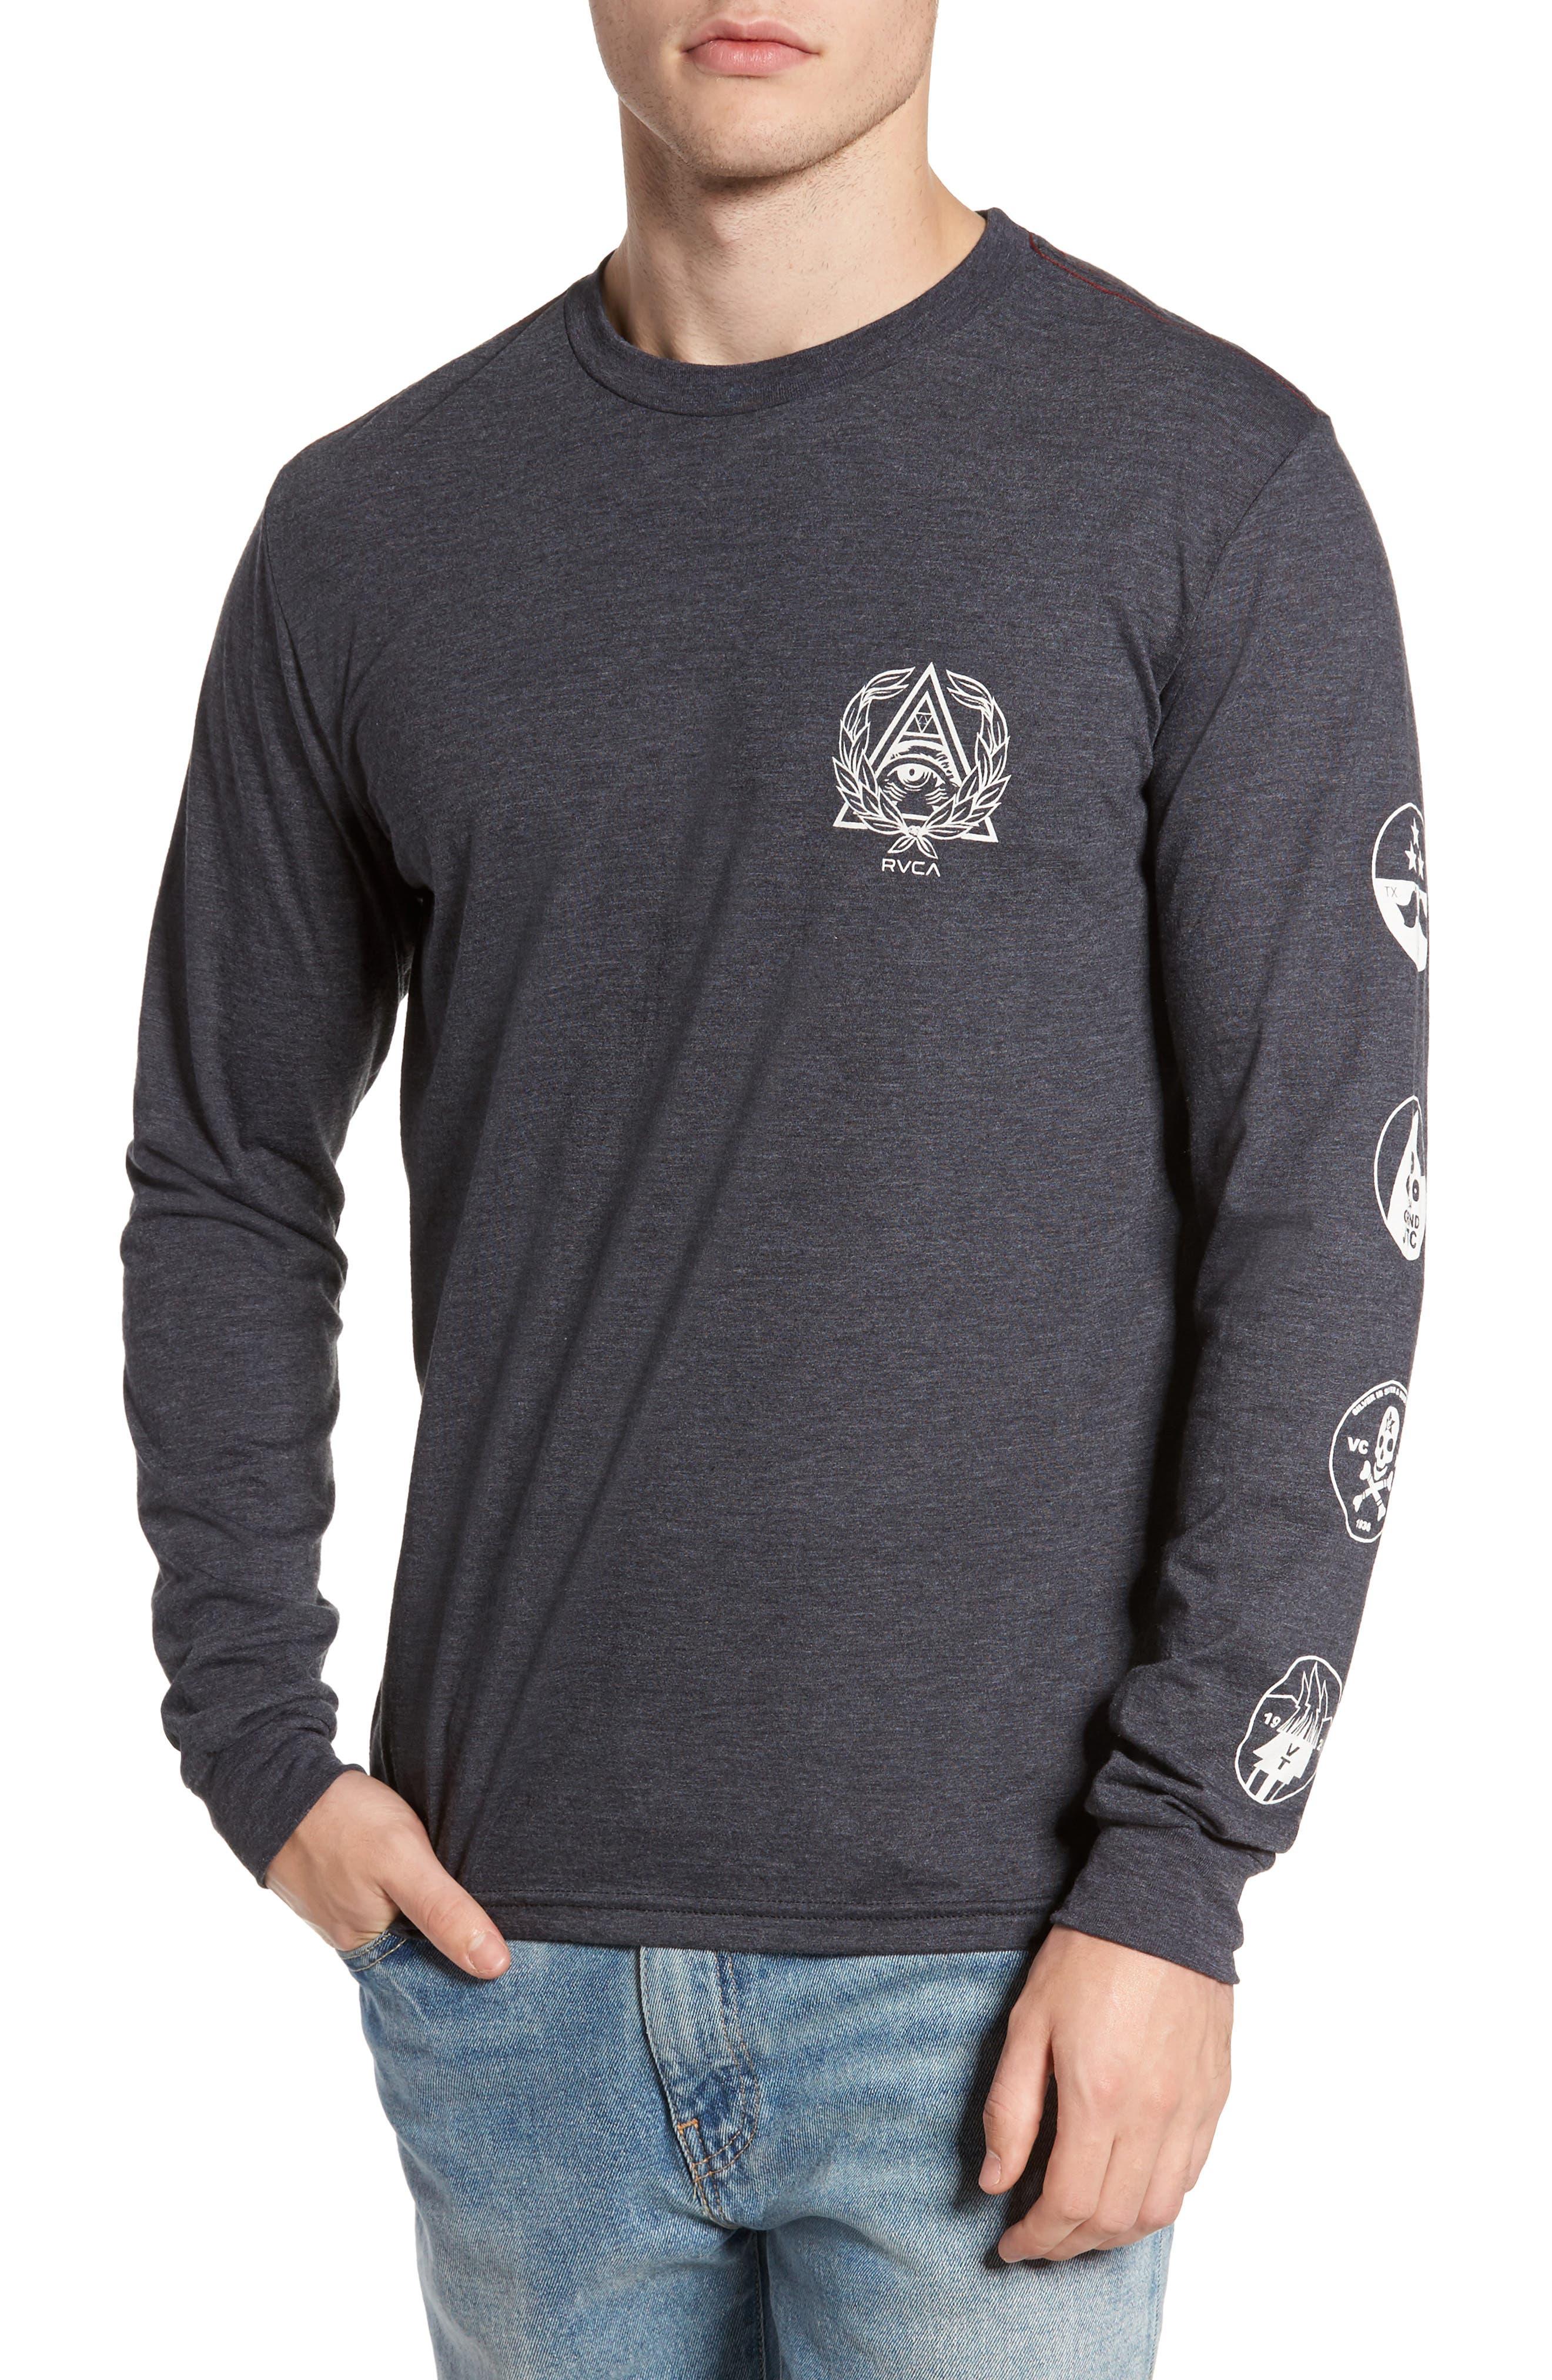 Prigus Sport Team T-Shirt,                         Main,                         color, 001